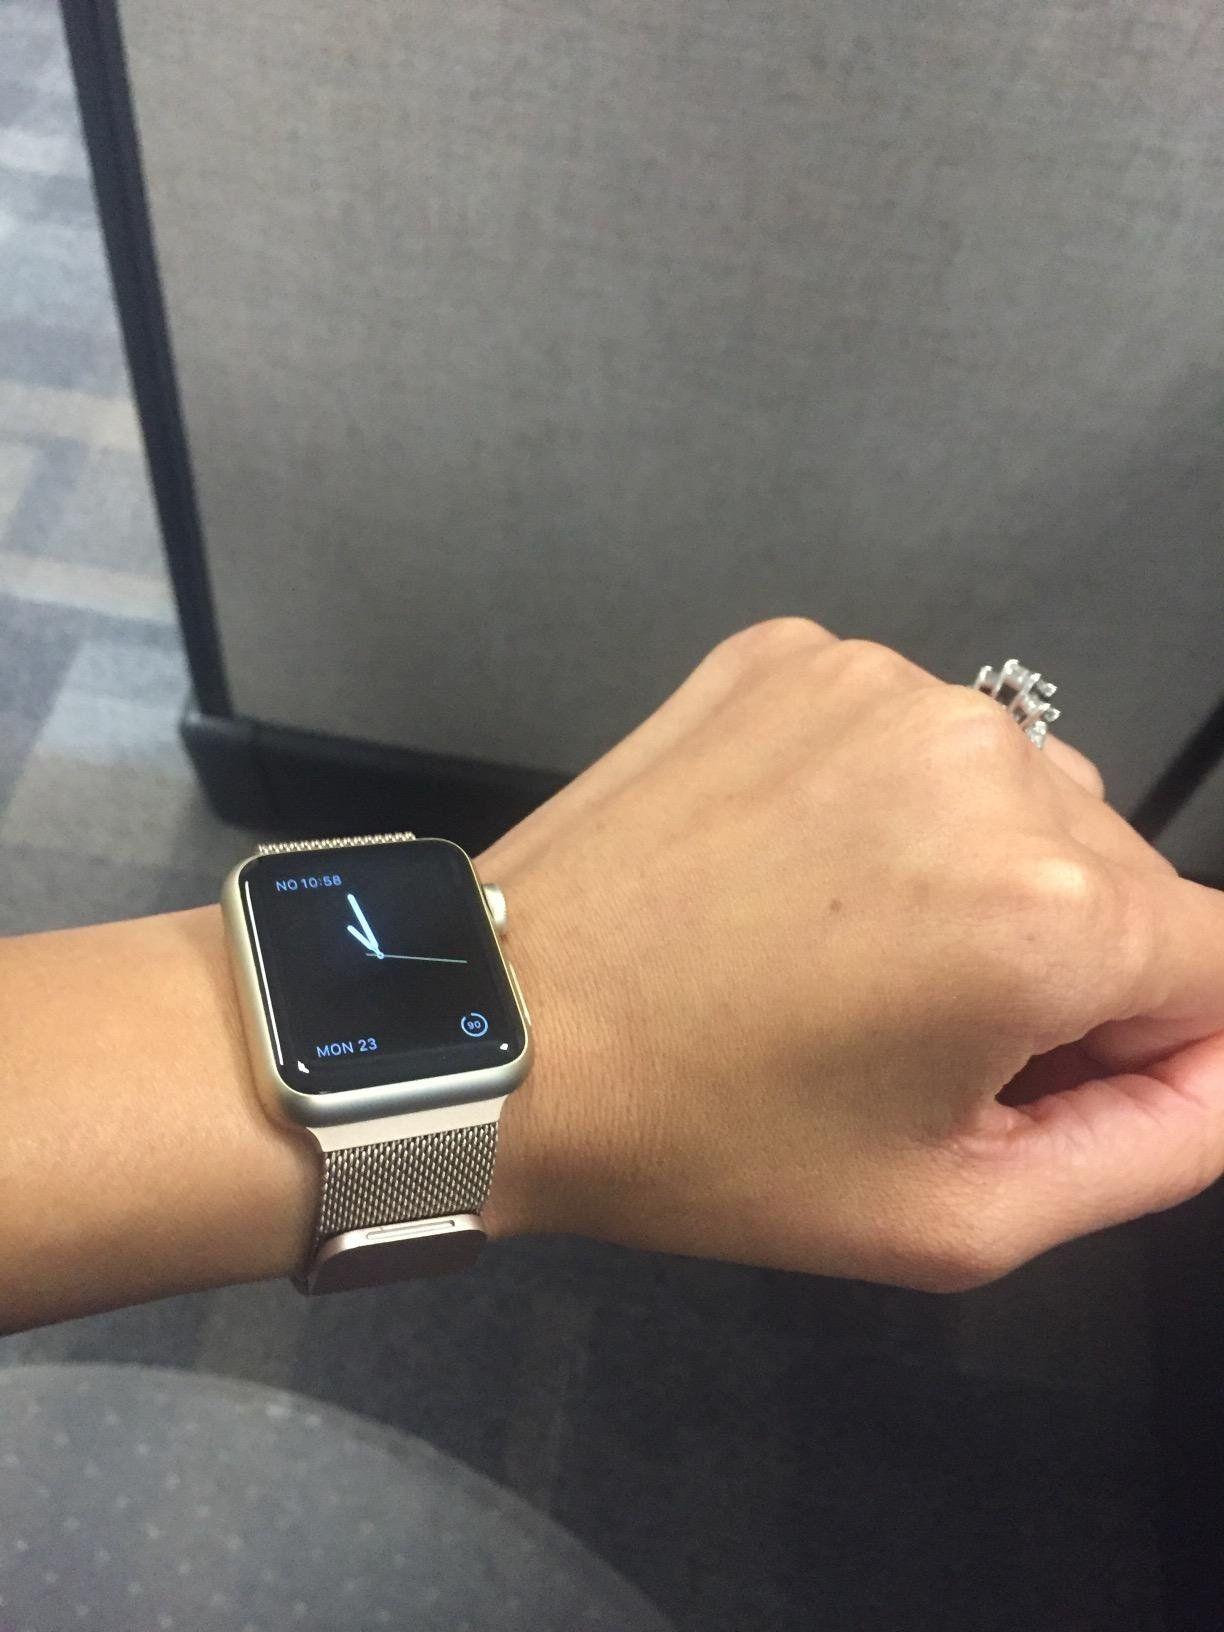 e6ebd415055 Amazon.com  Apple Watch Band